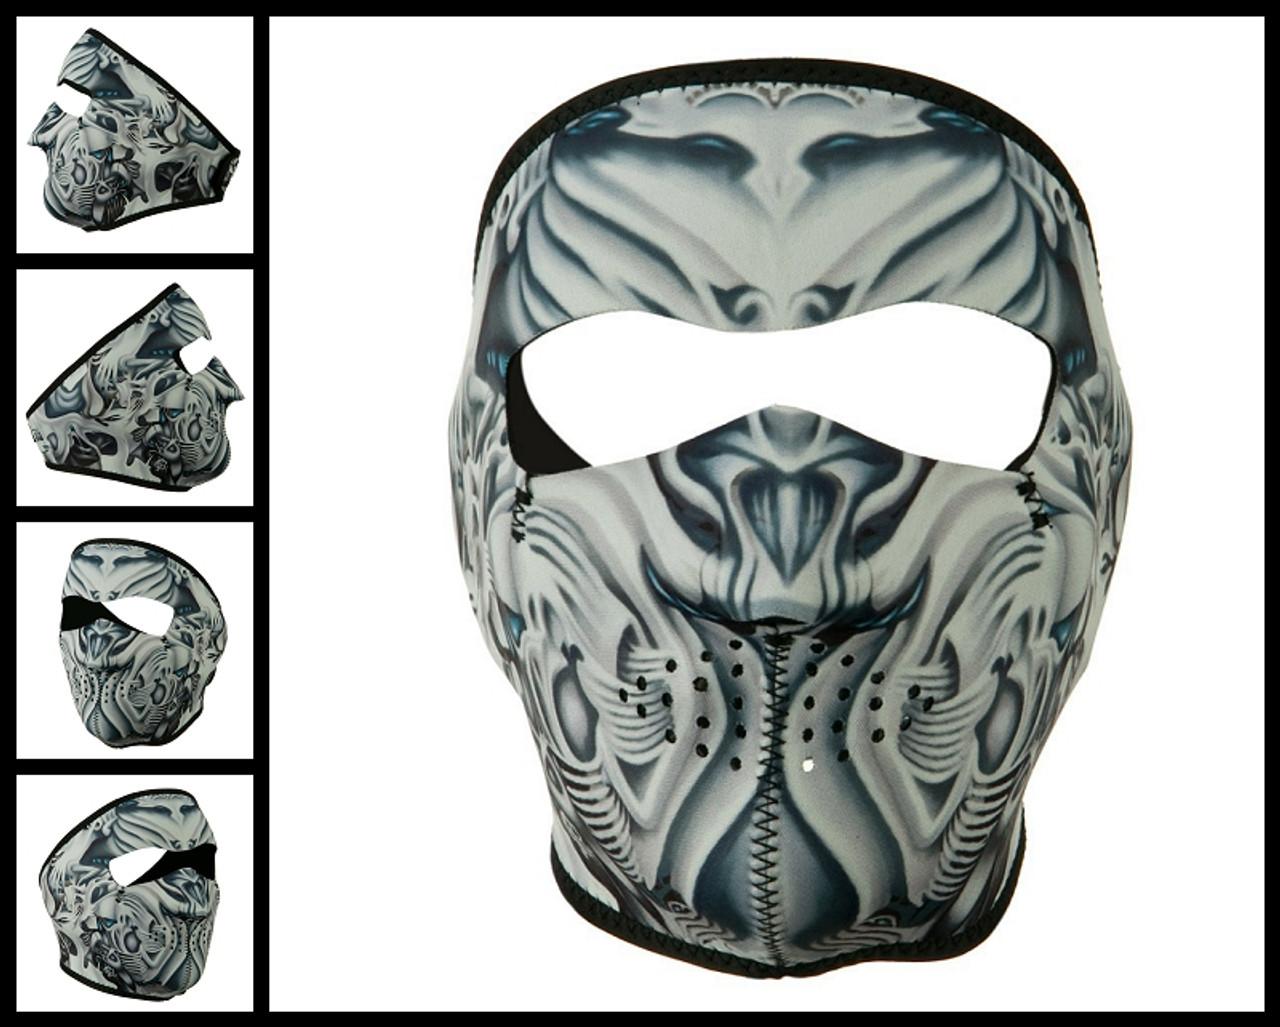 08a5b4e25db58 Bio-Mechanical Neoprene Face Mask